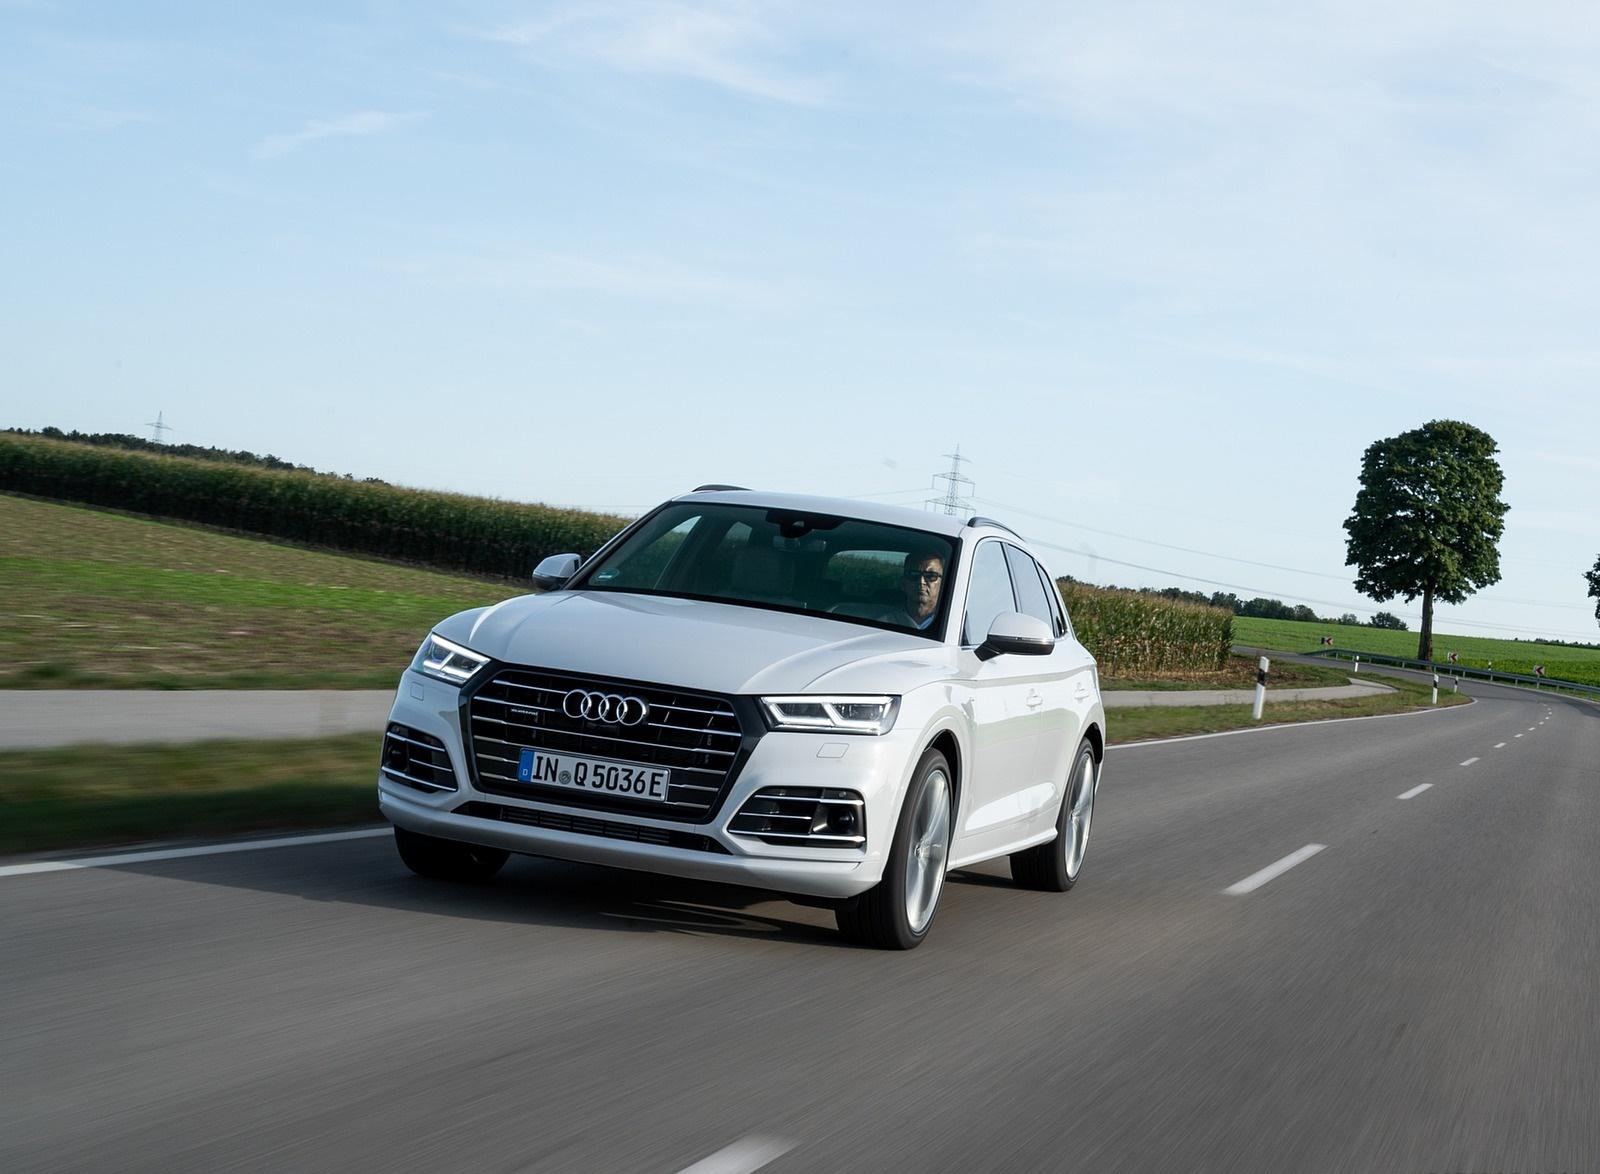 2020 Audi Q5 TFSI e Plug-In Hybrid (Color: Glacier White) Front Wallpapers #13 of 154